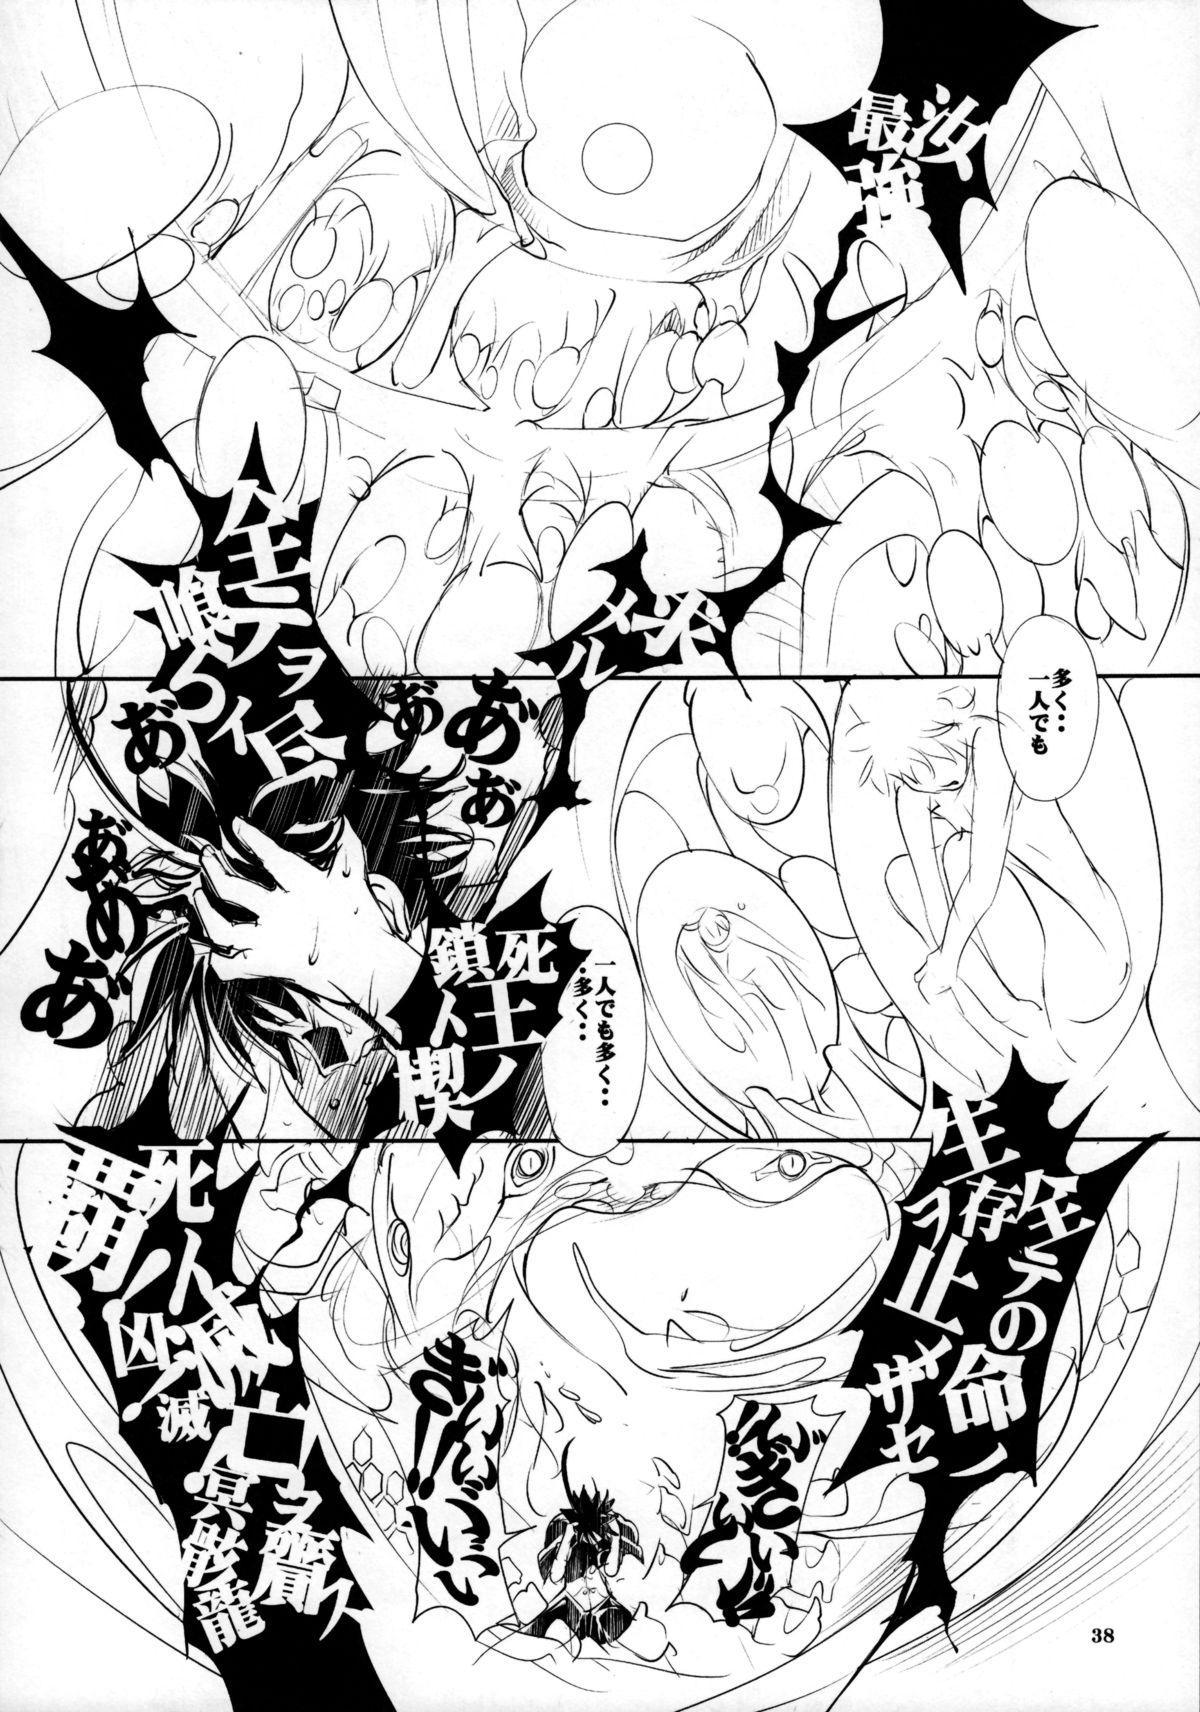 (C89) [Algolagnia (Mikoshiro Honnin)] Naruto [saga] sei (NARUTO) 37